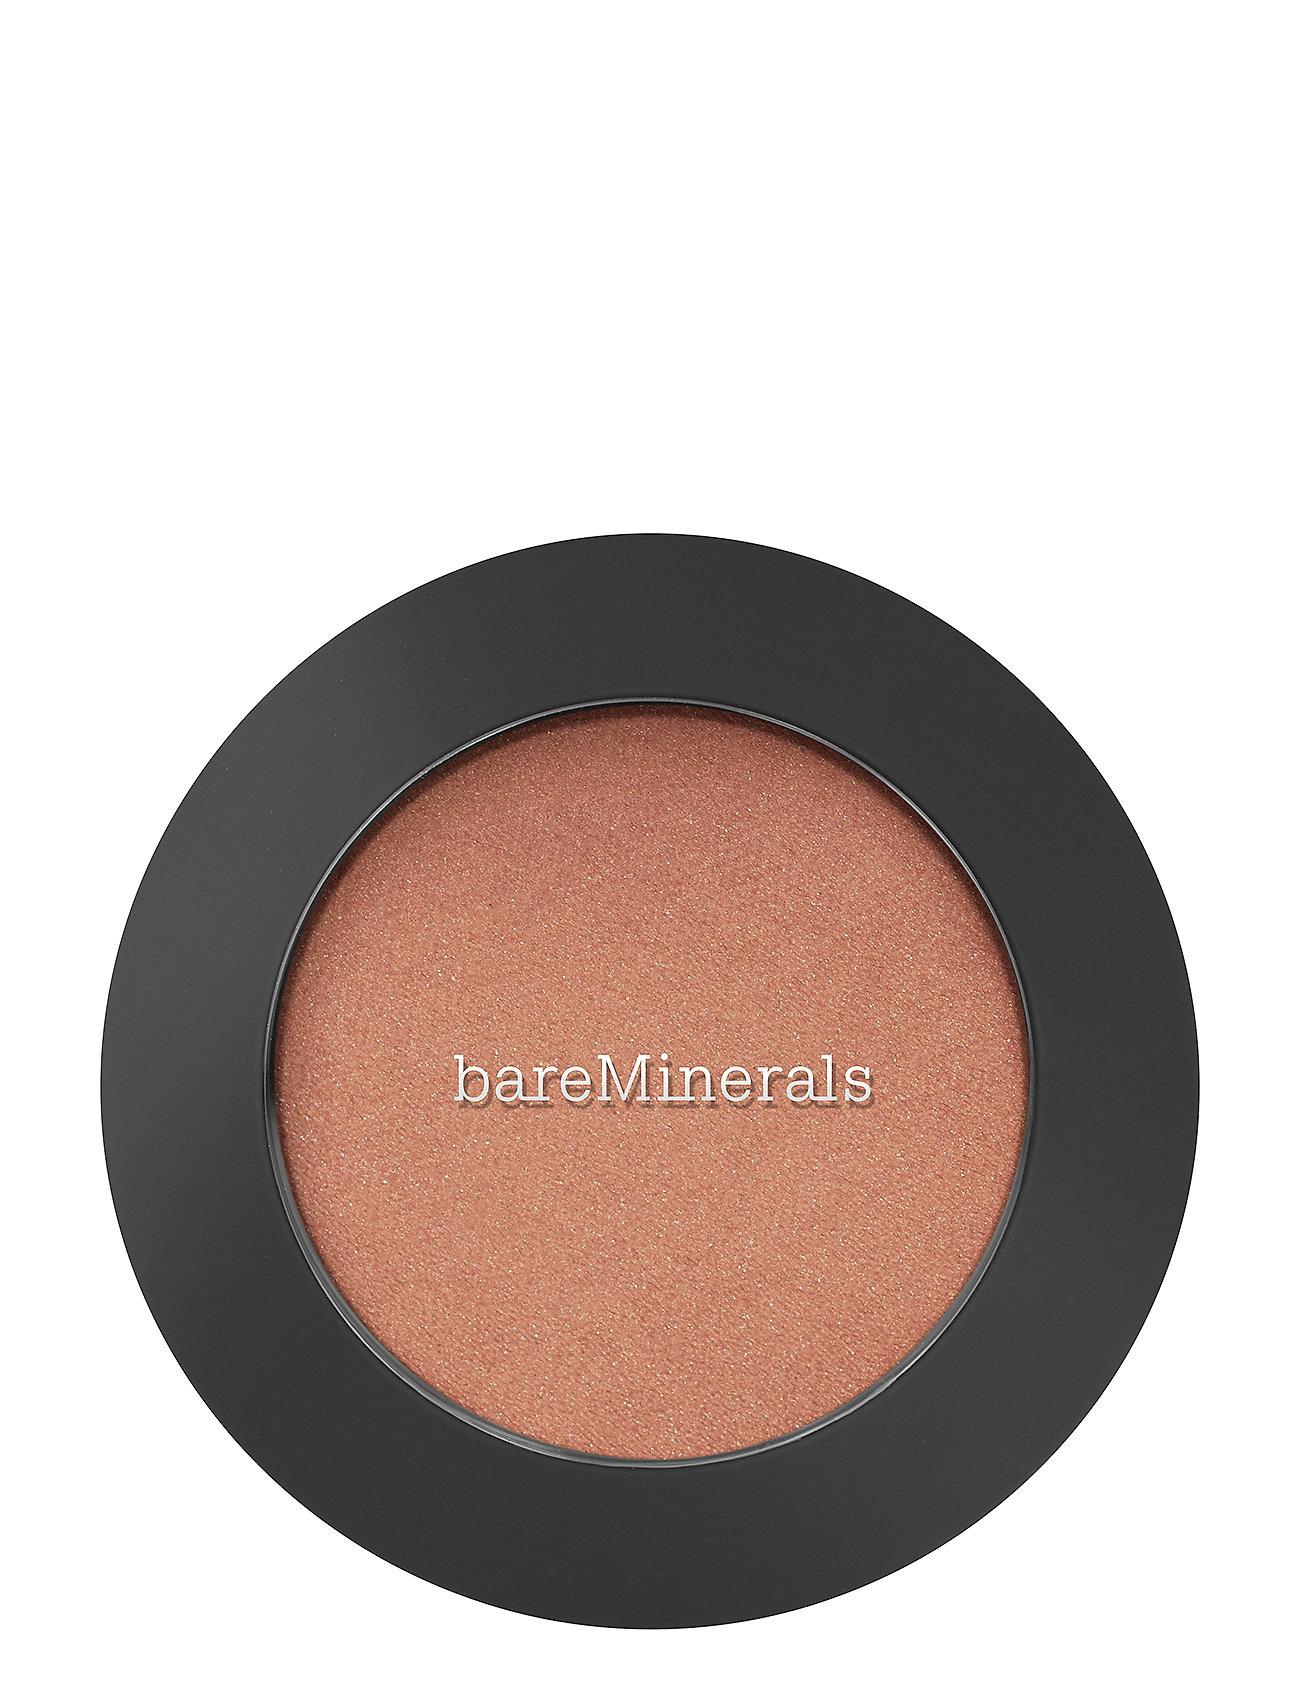 Image of Bounce & Blur Blush Blurred Buff Beauty WOMEN Makeup Face Blush Lyserød BareMinerals (3270673175)